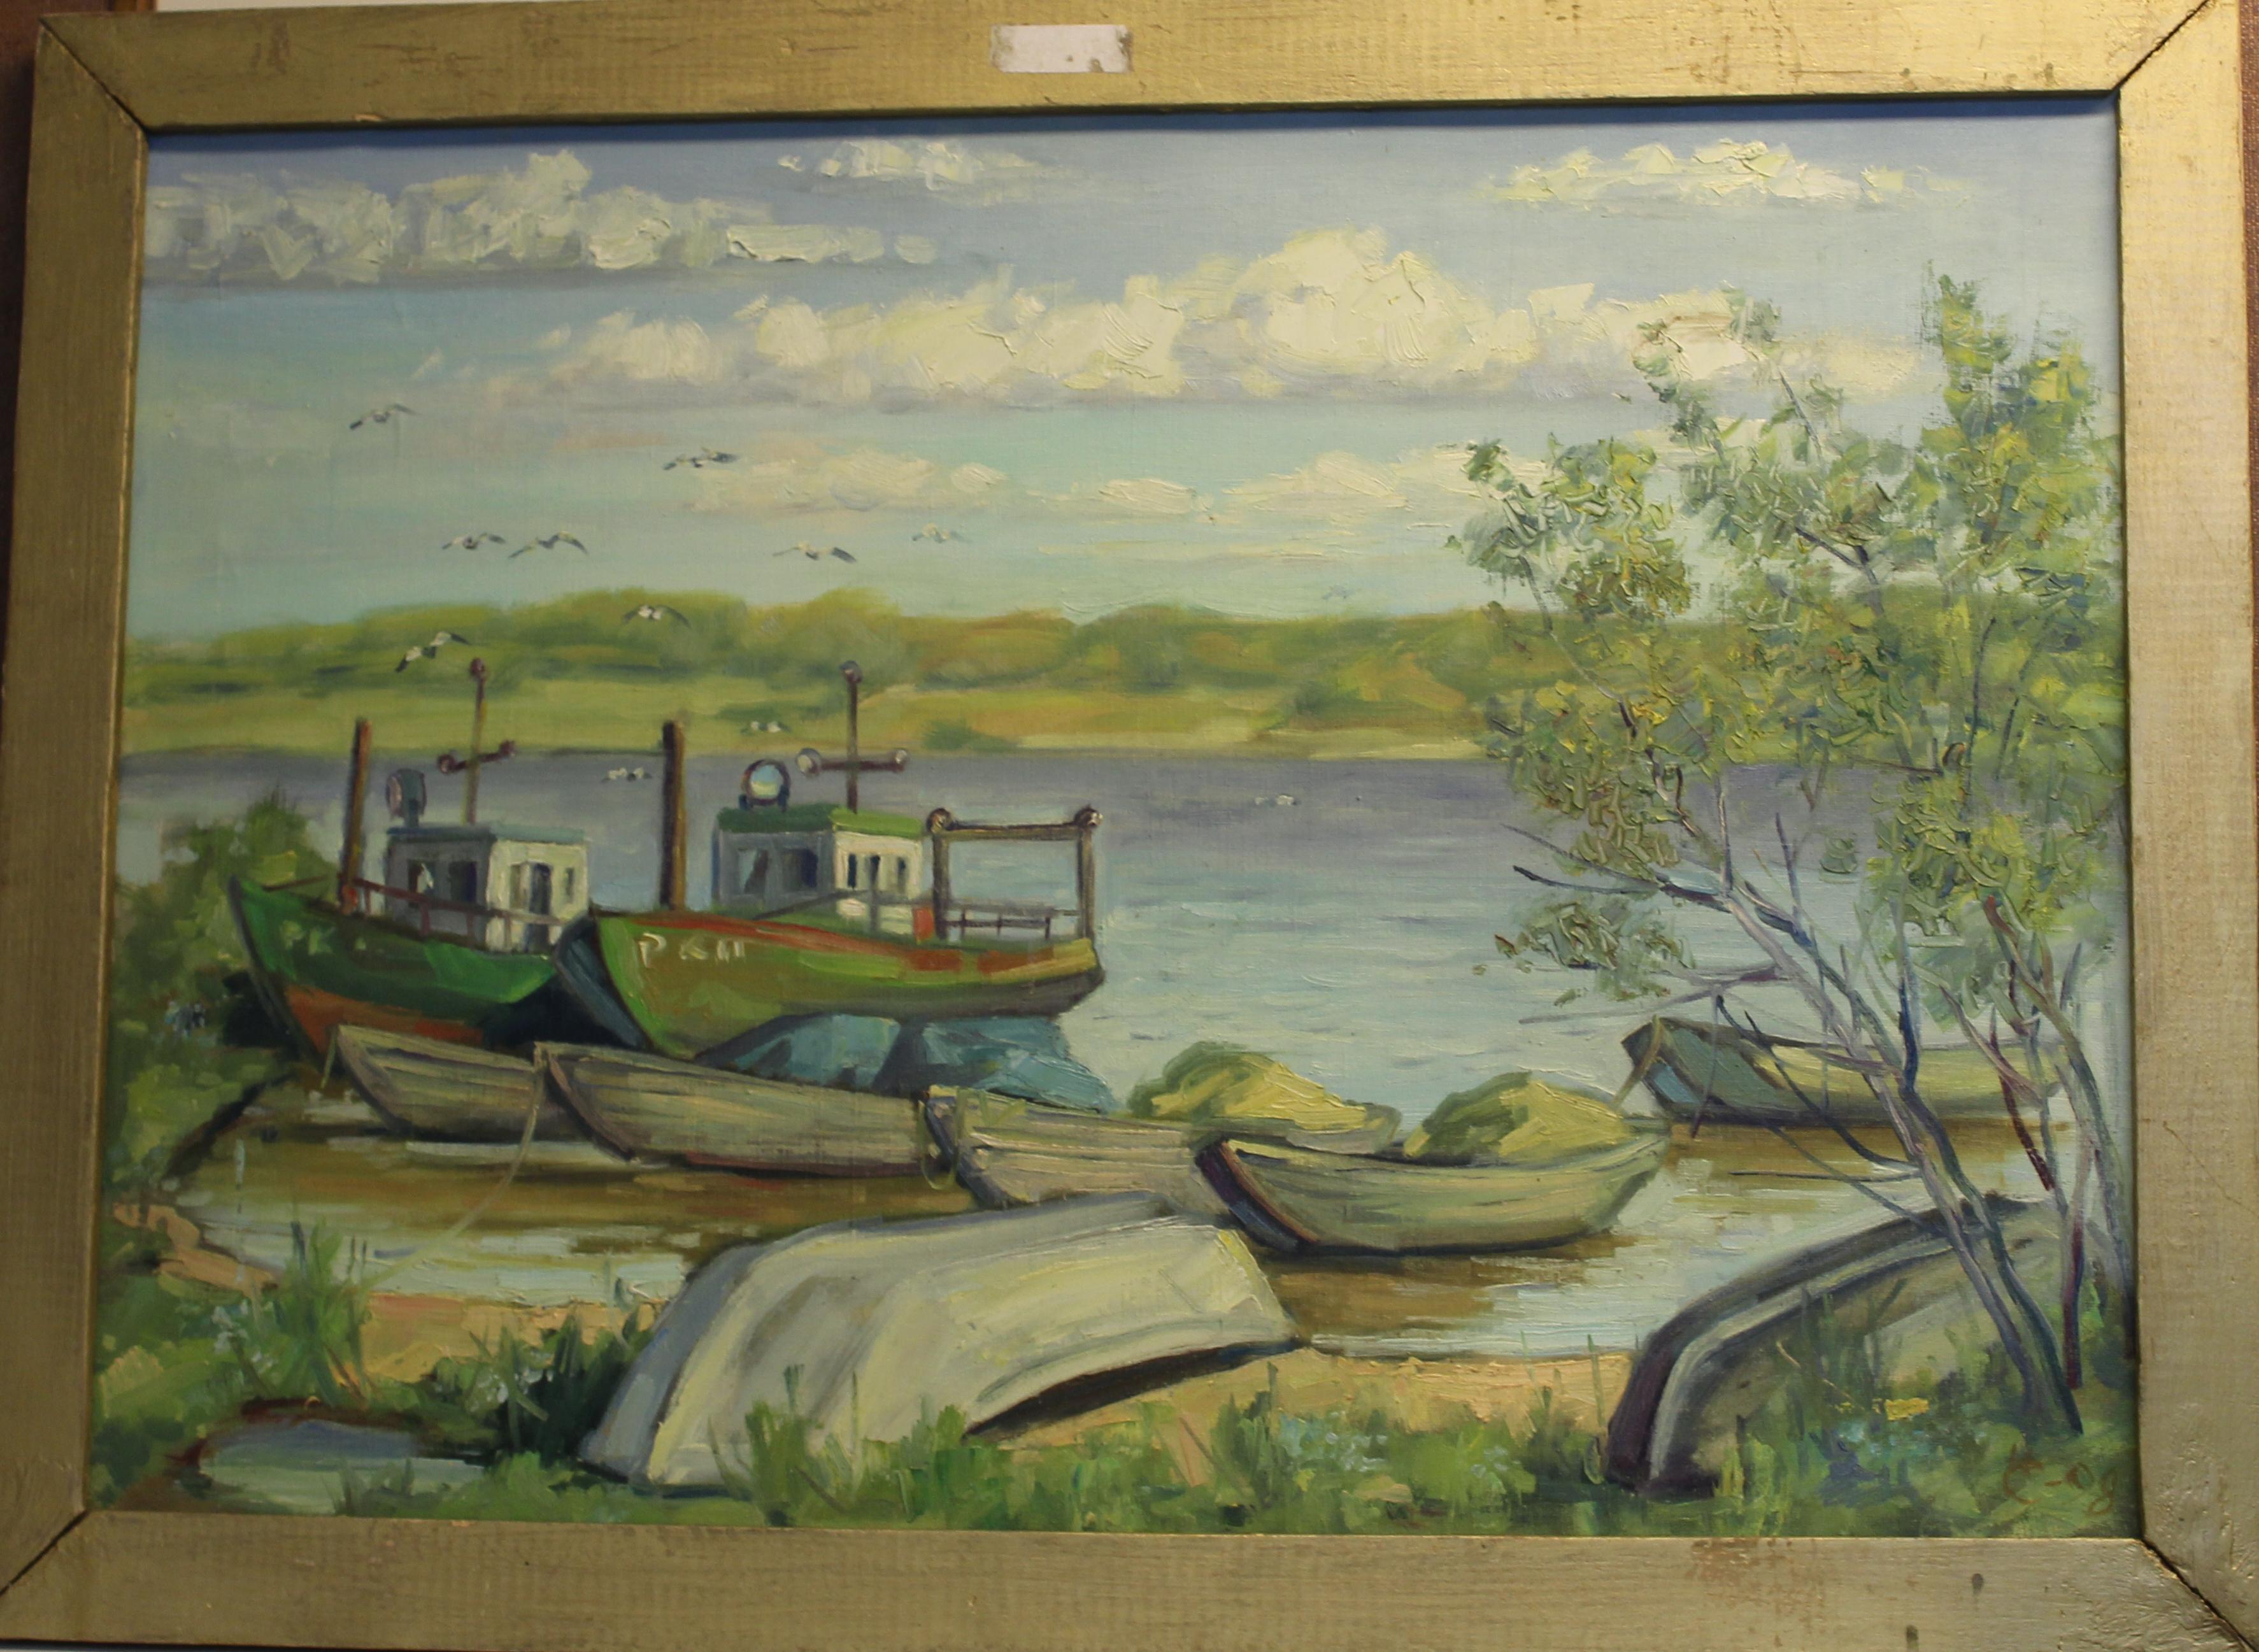 Волга- рыбацкие баркасы